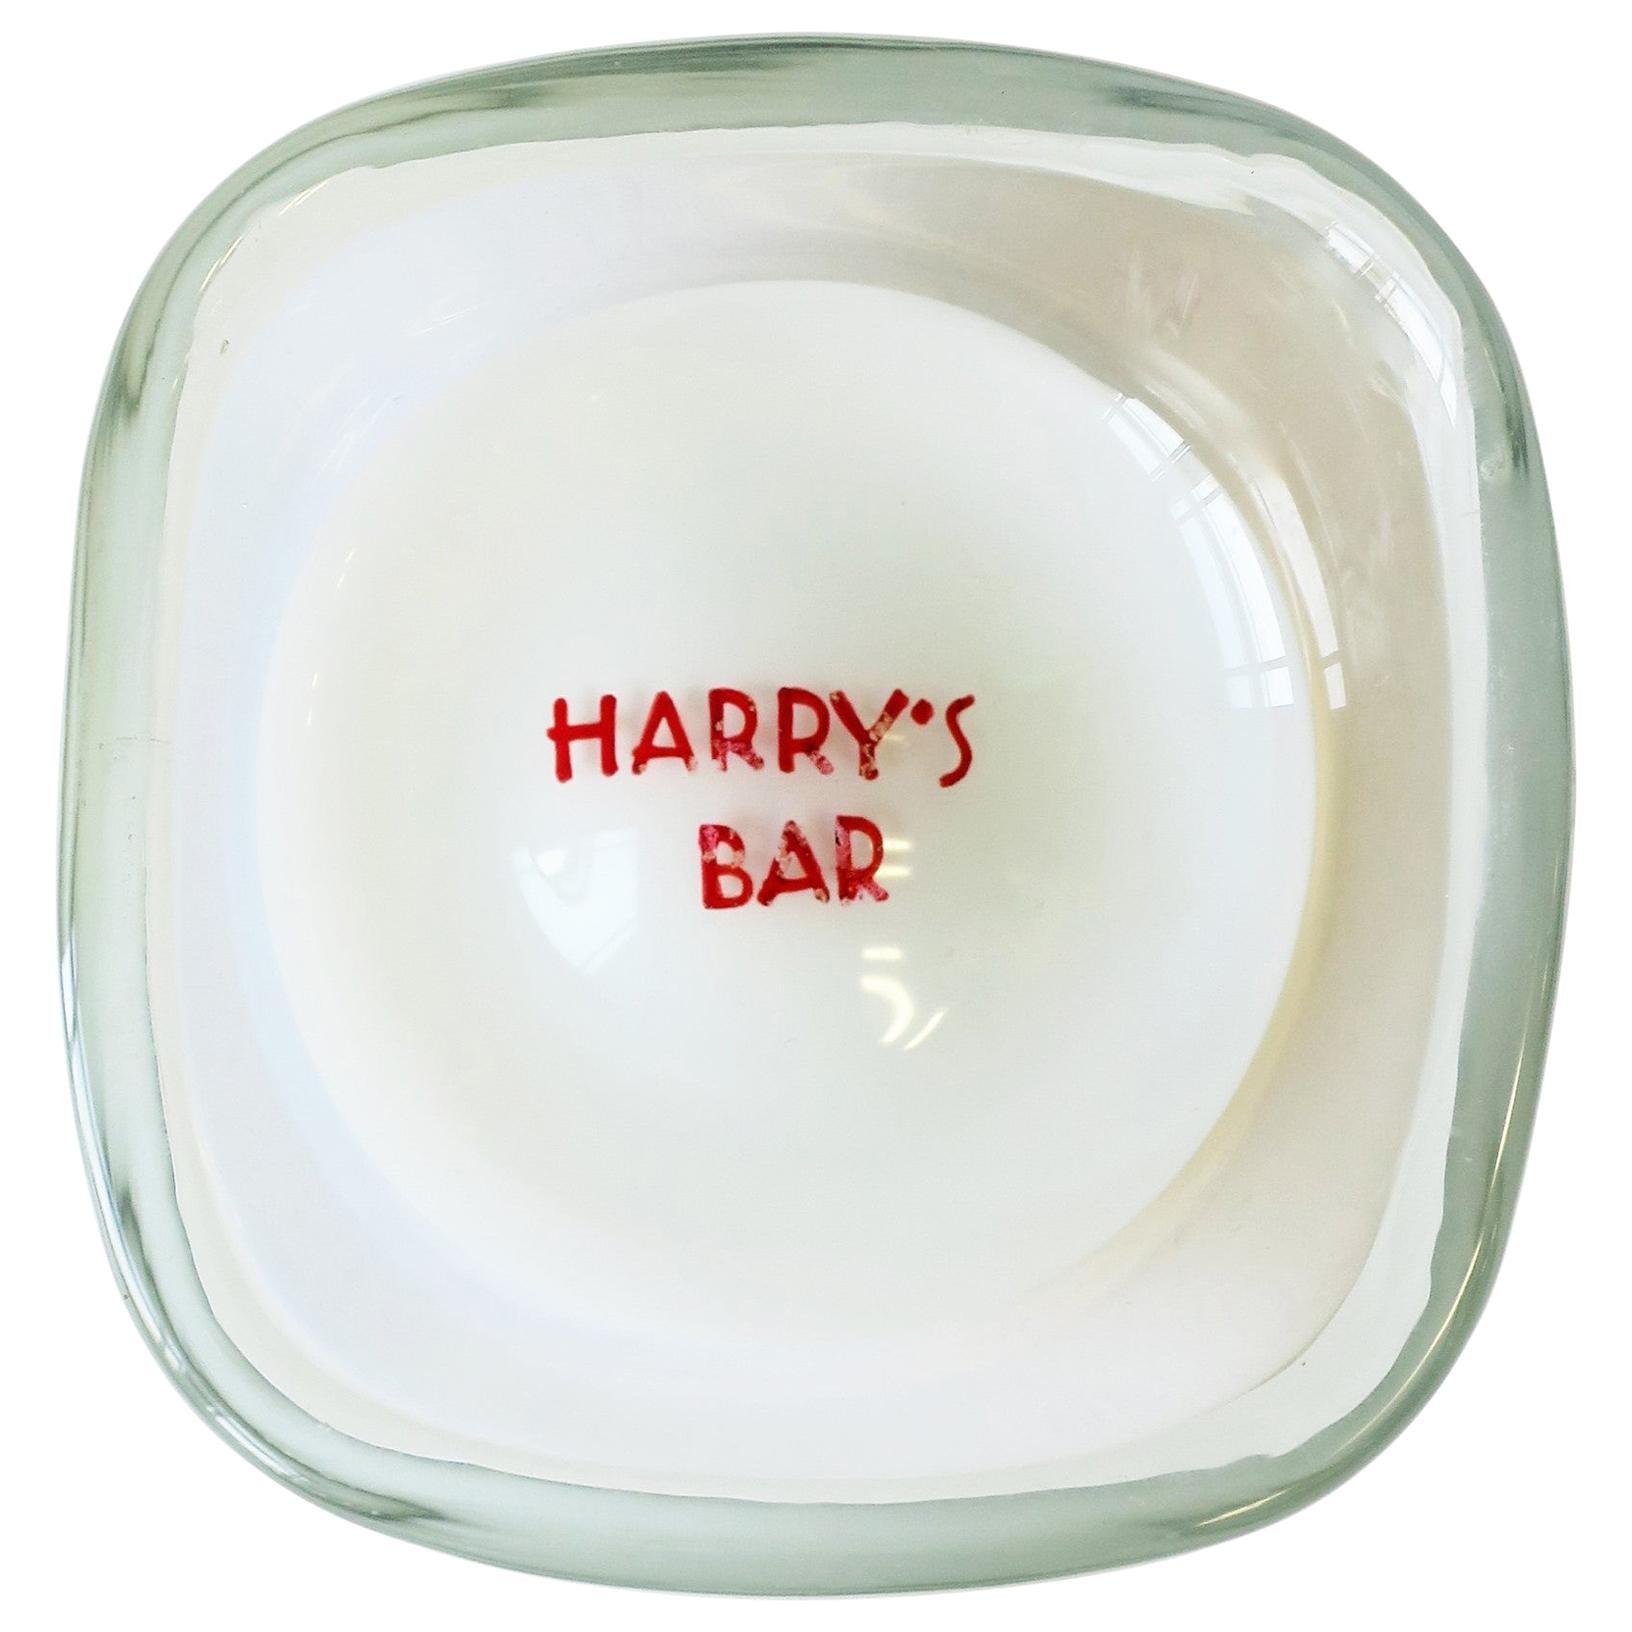 Harry's Bar Italian Murano Art Glass Bowl